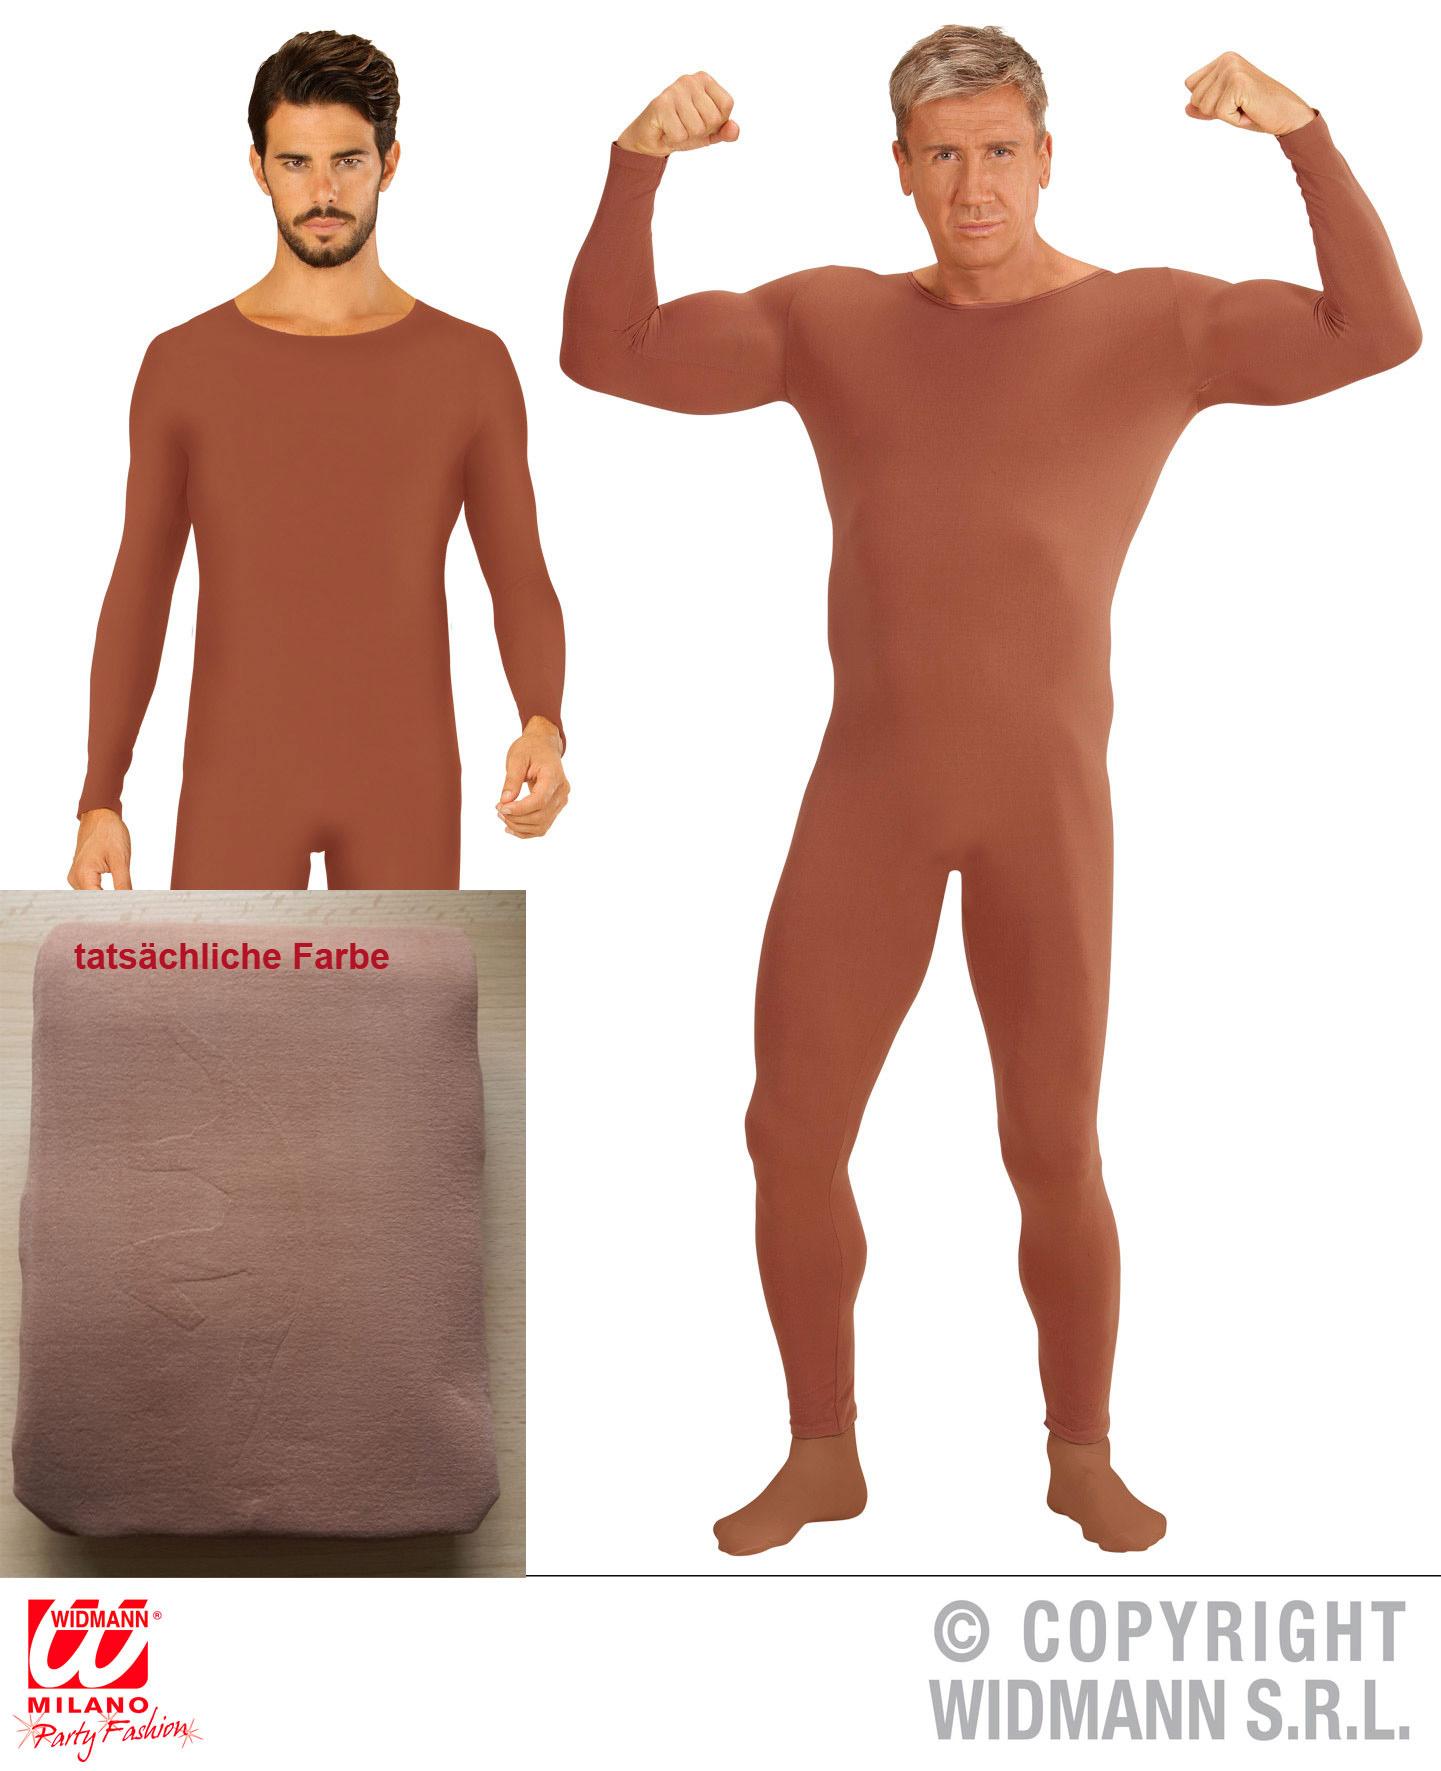 Einteiler, Overall, Body, Langarm hautfarben,Tanz Sport braun Herren, M, L, XL